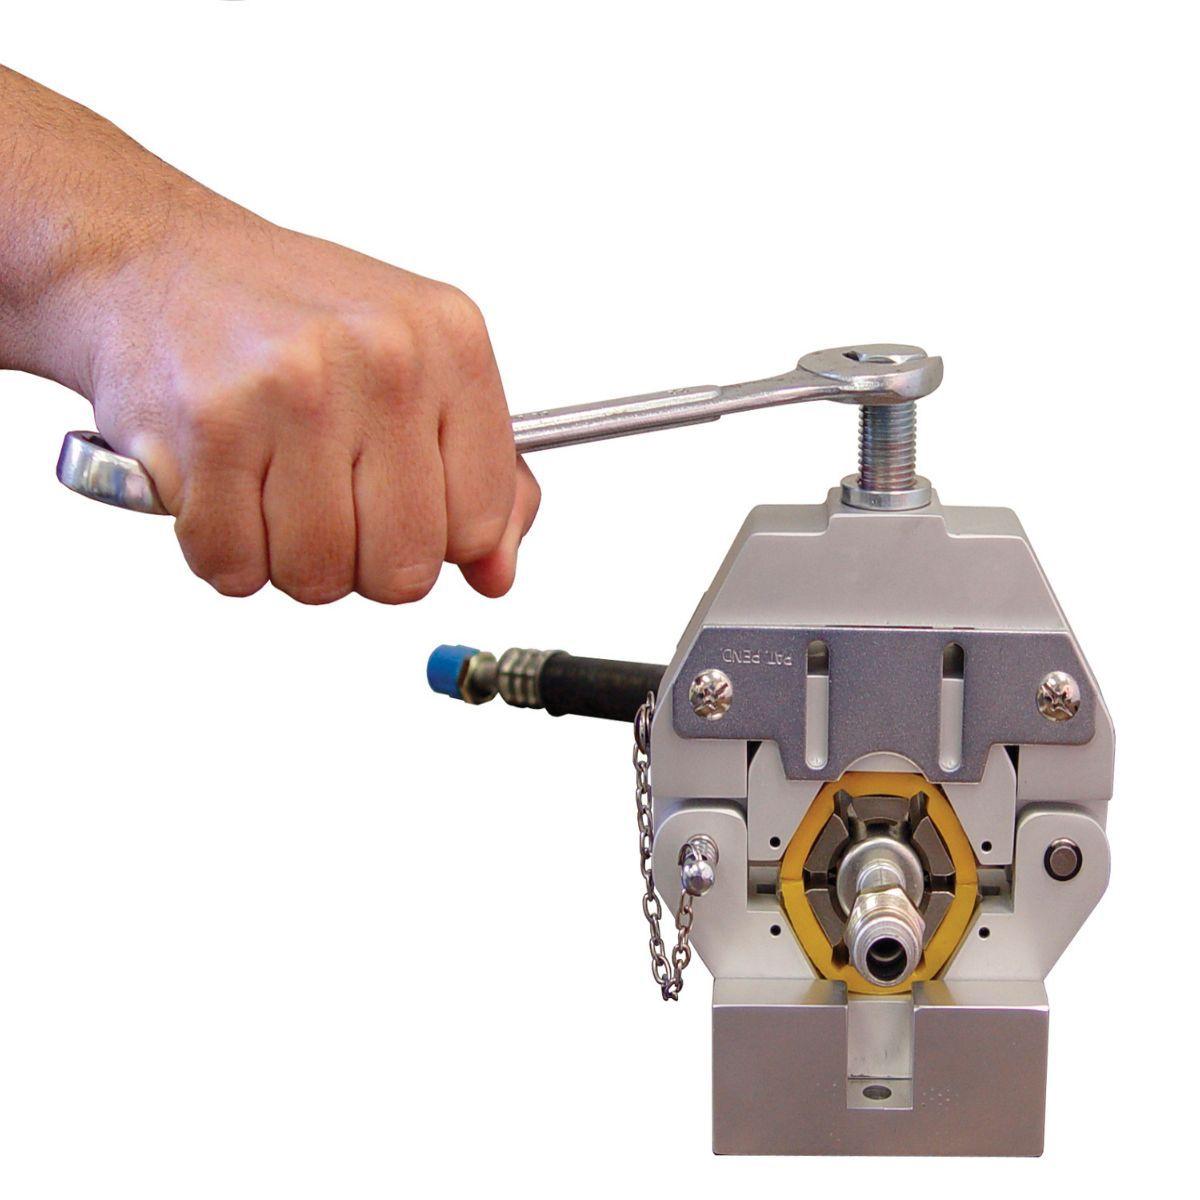 Clipadeira Manual Automotiva 71550 002 Mastercool